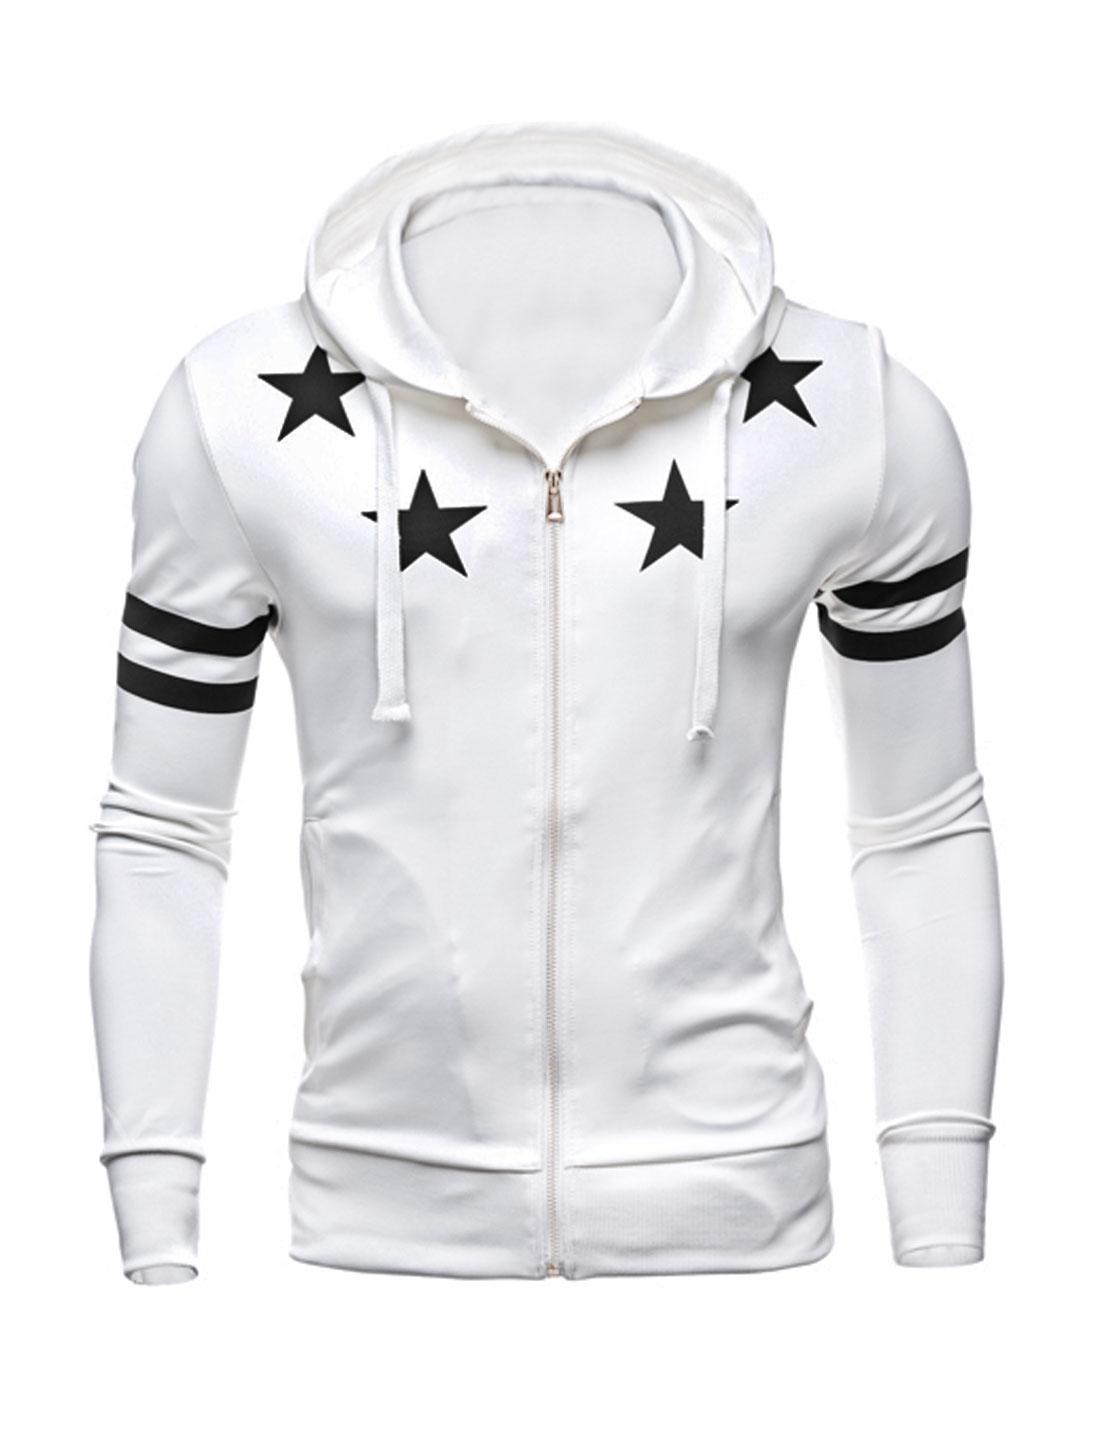 Men Zip Closed Stars Stripes Slim Fit Hooded Jacket White M